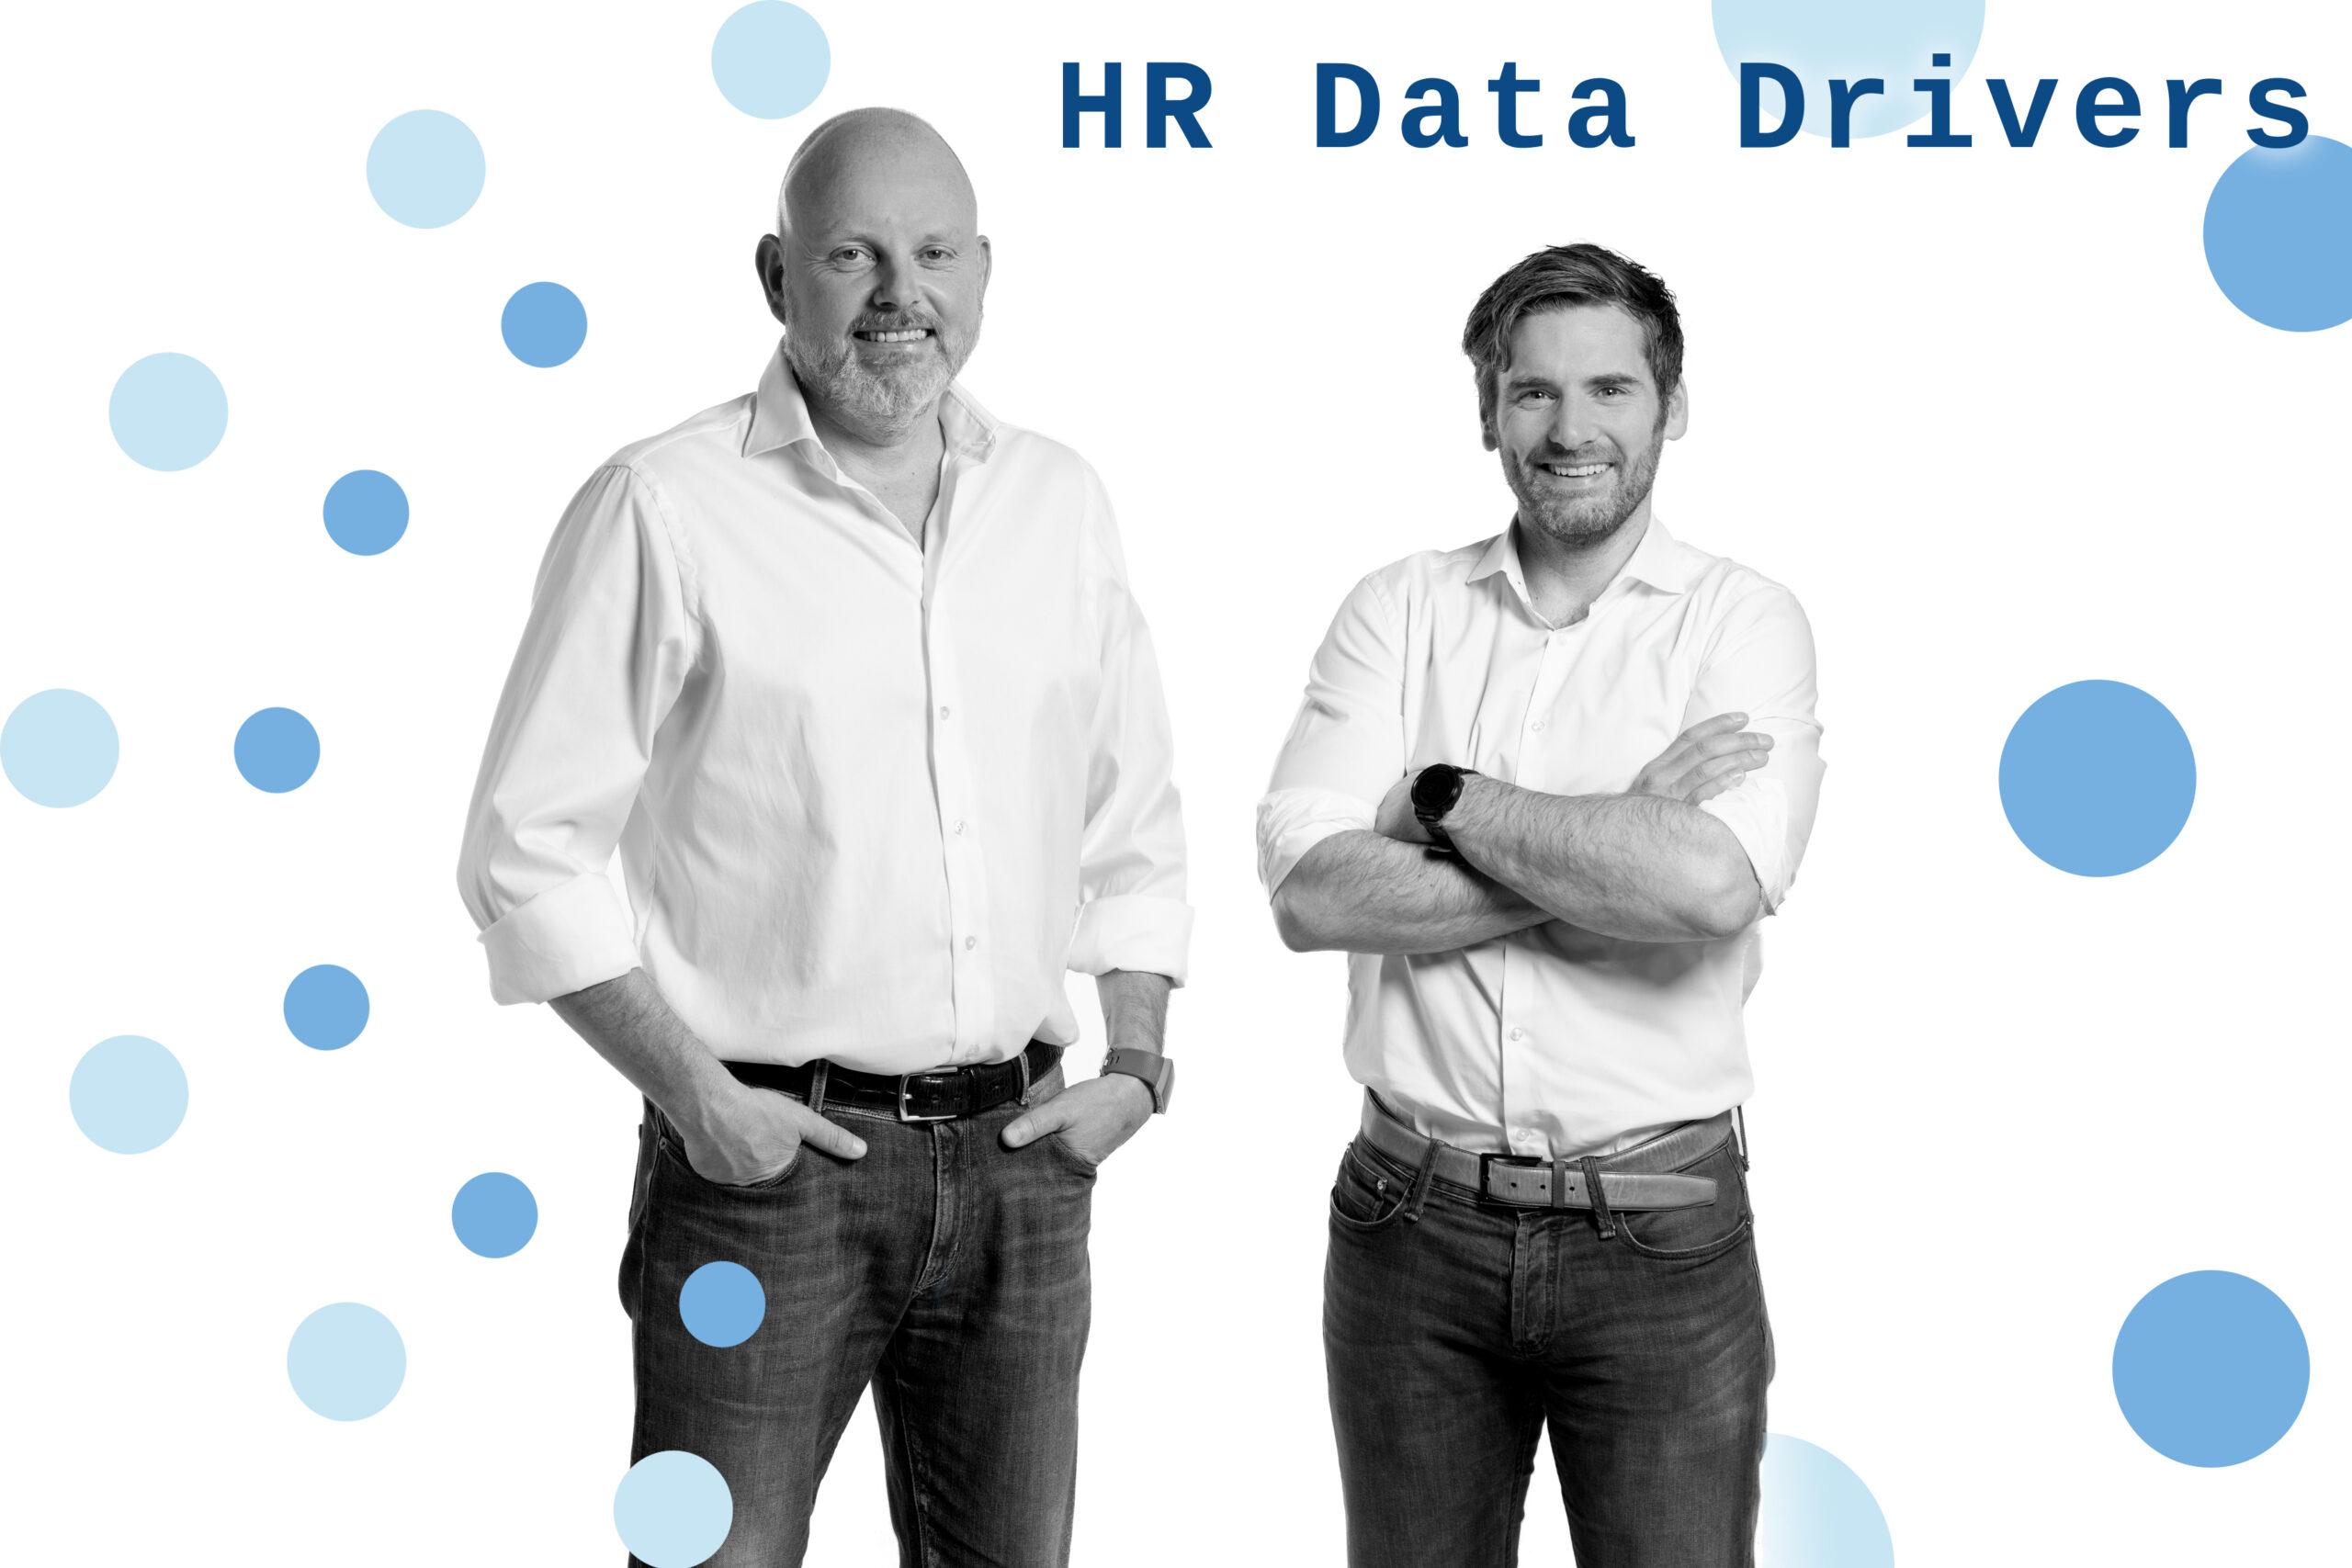 HR Data Drivers Frank Groenewold & Eef Bloemers